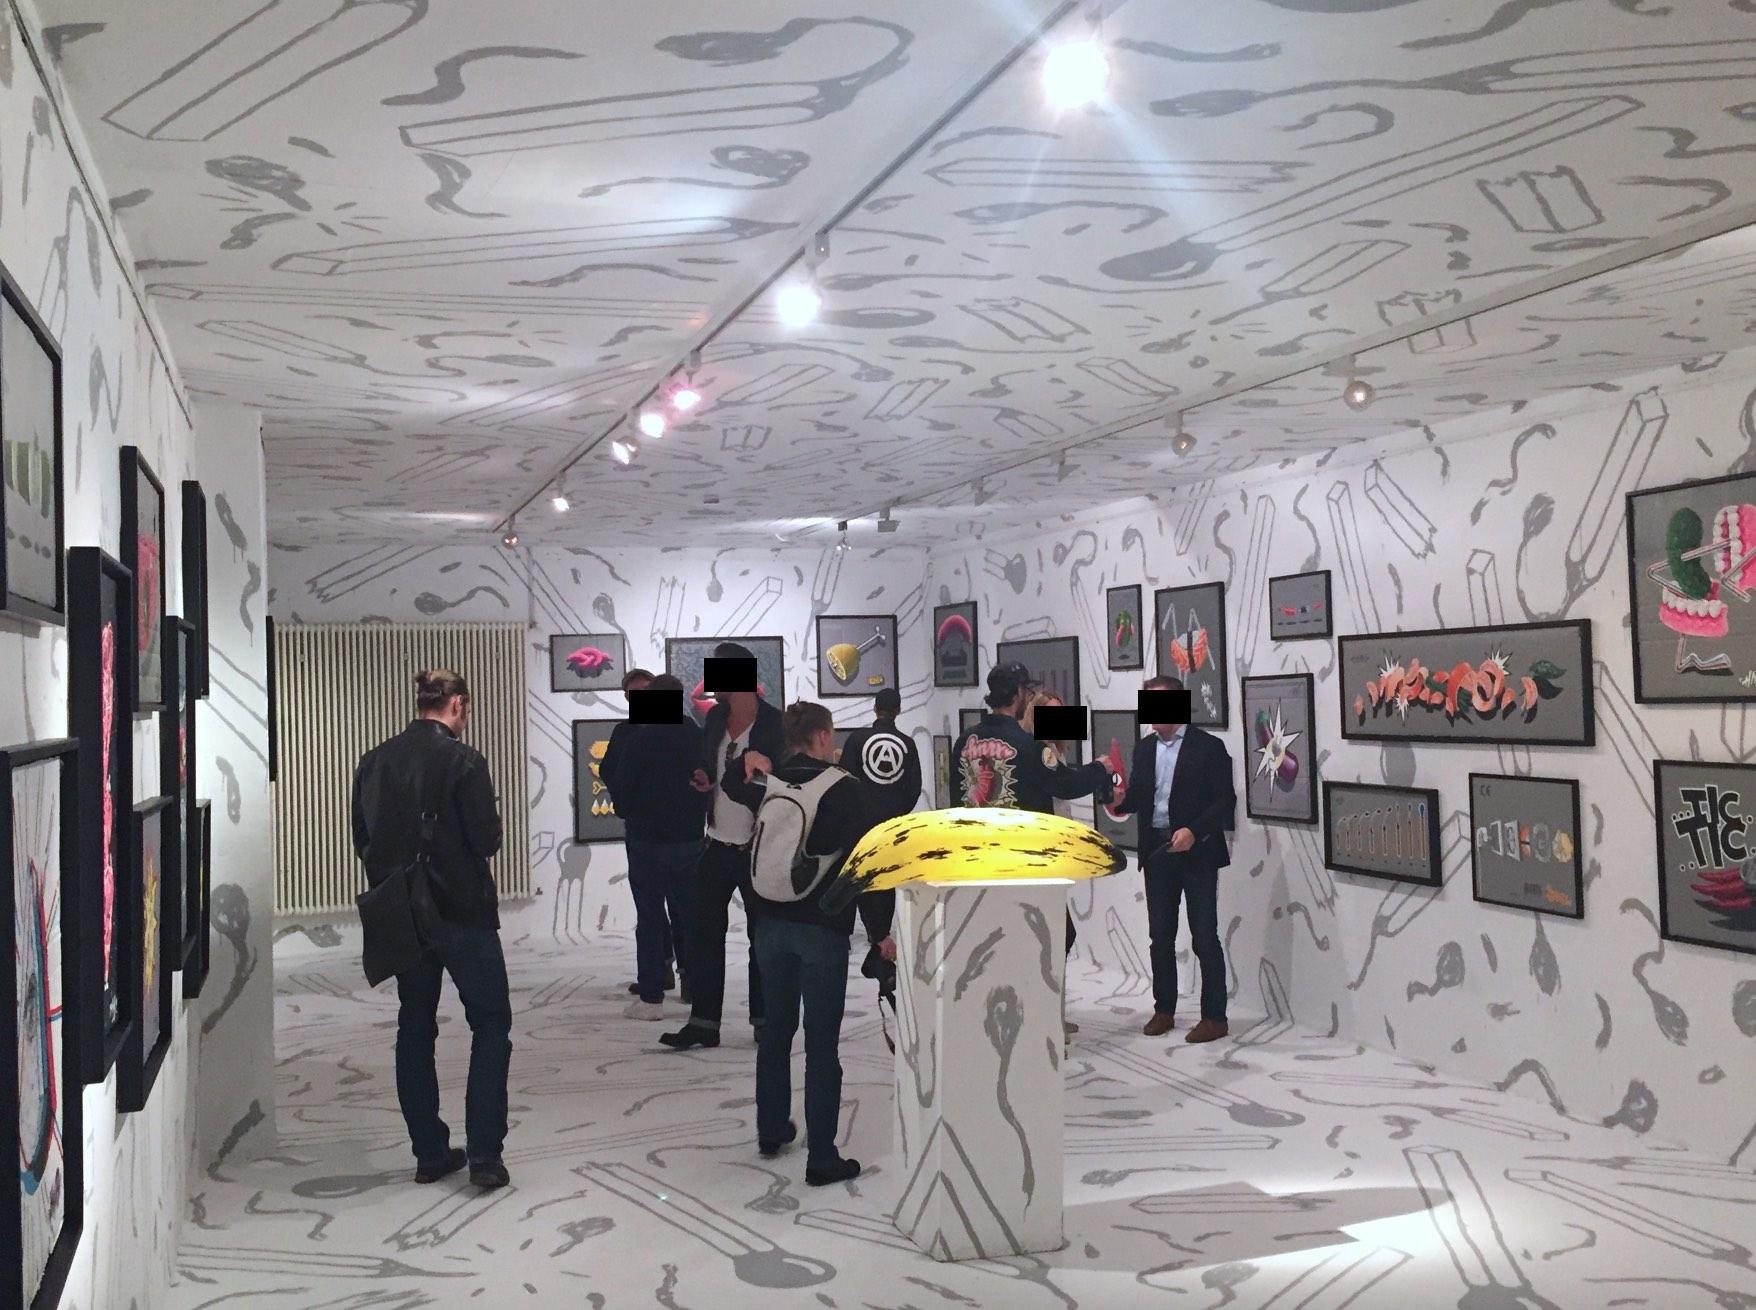 hnrx vernissage m nchen art avenue. Black Bedroom Furniture Sets. Home Design Ideas